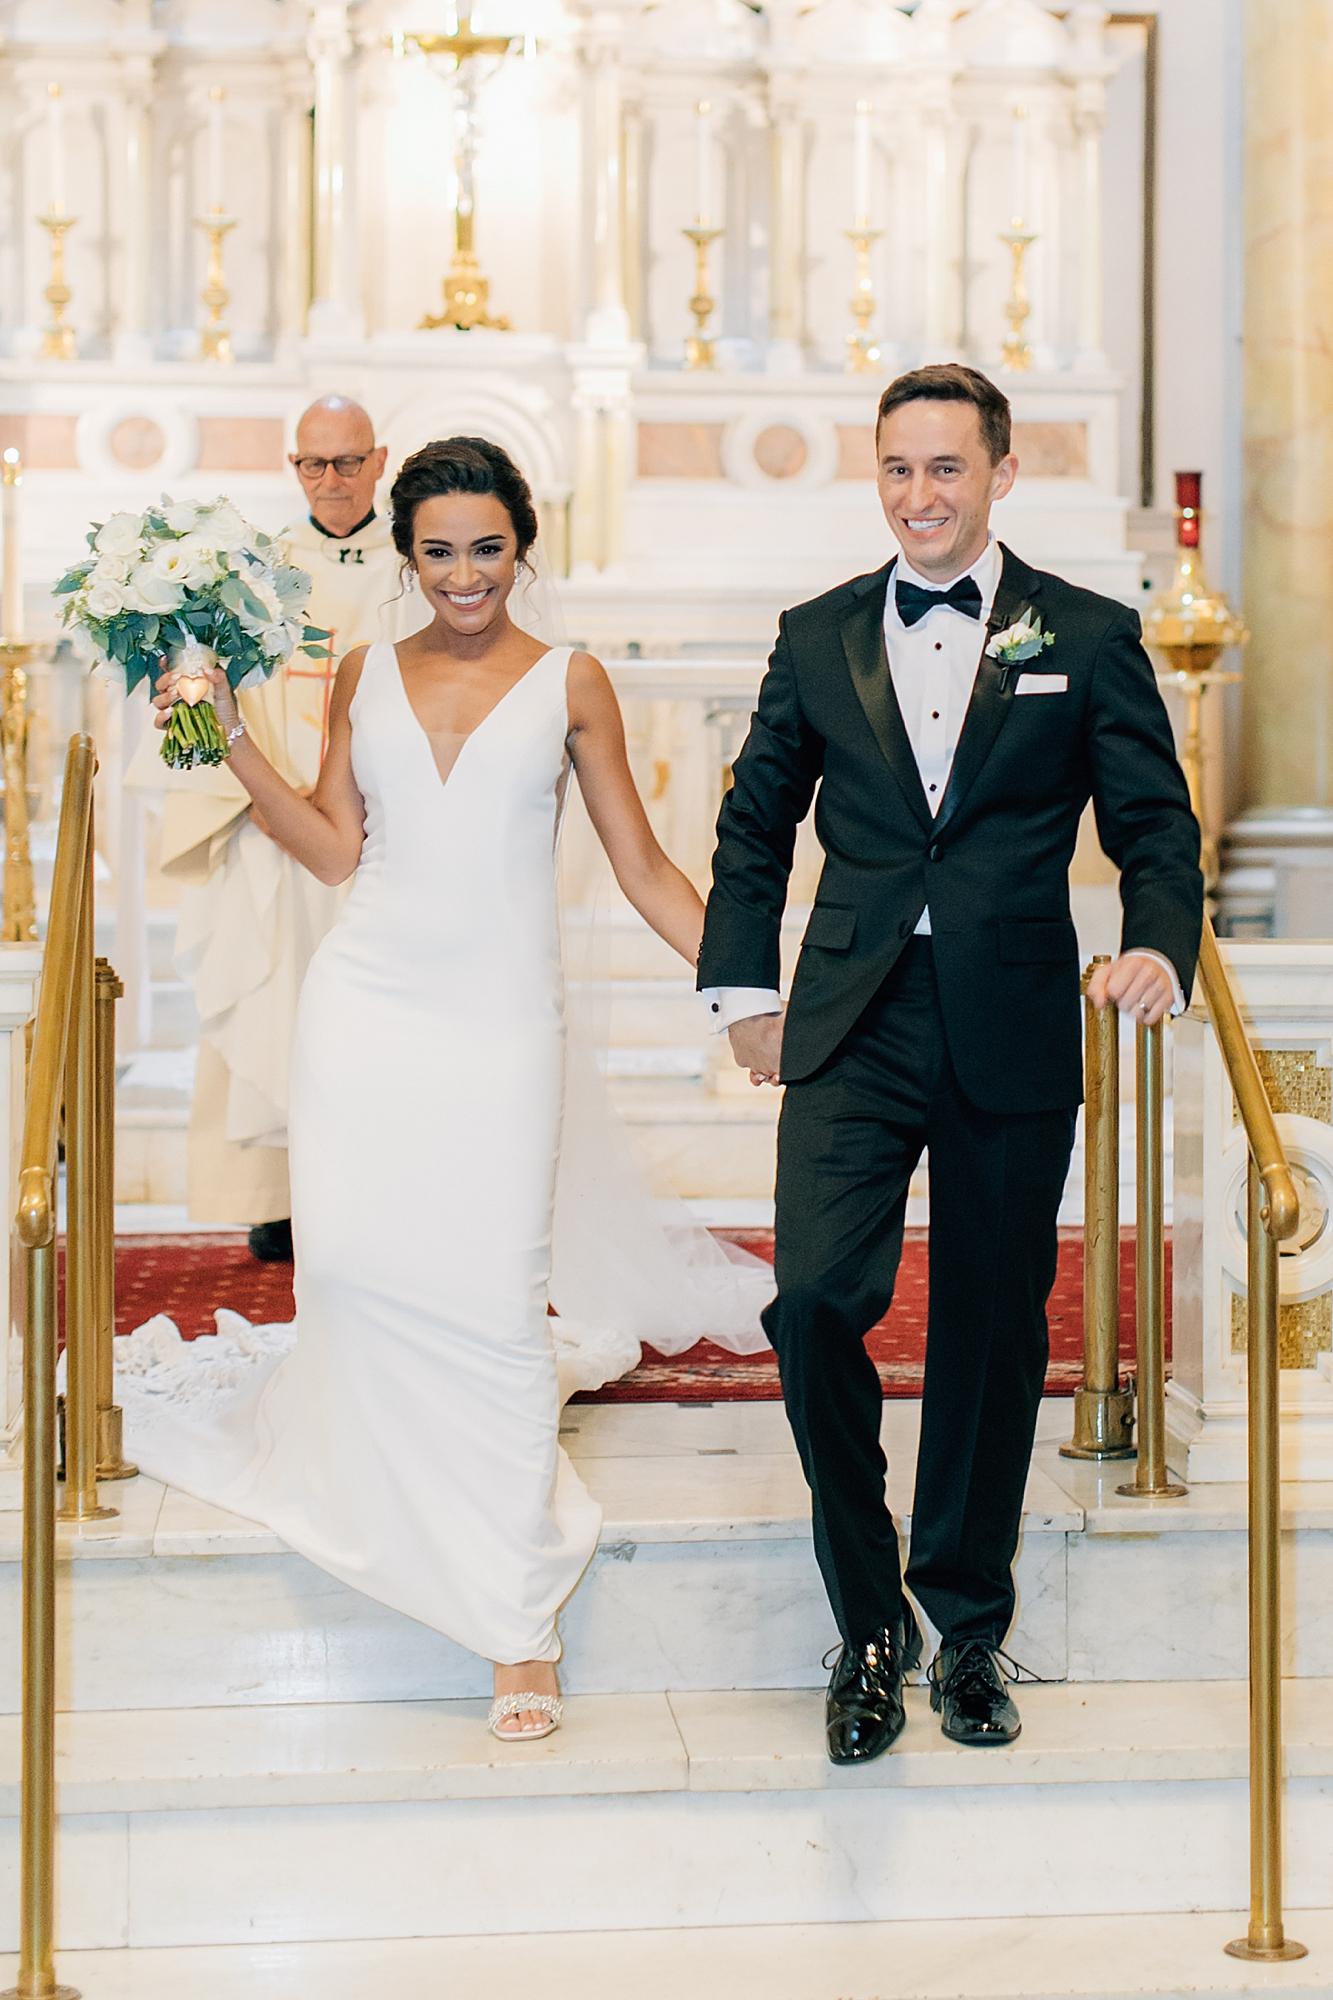 Cescaphe Philadelphia Film Wedding Photography by Magdalena Studios 19